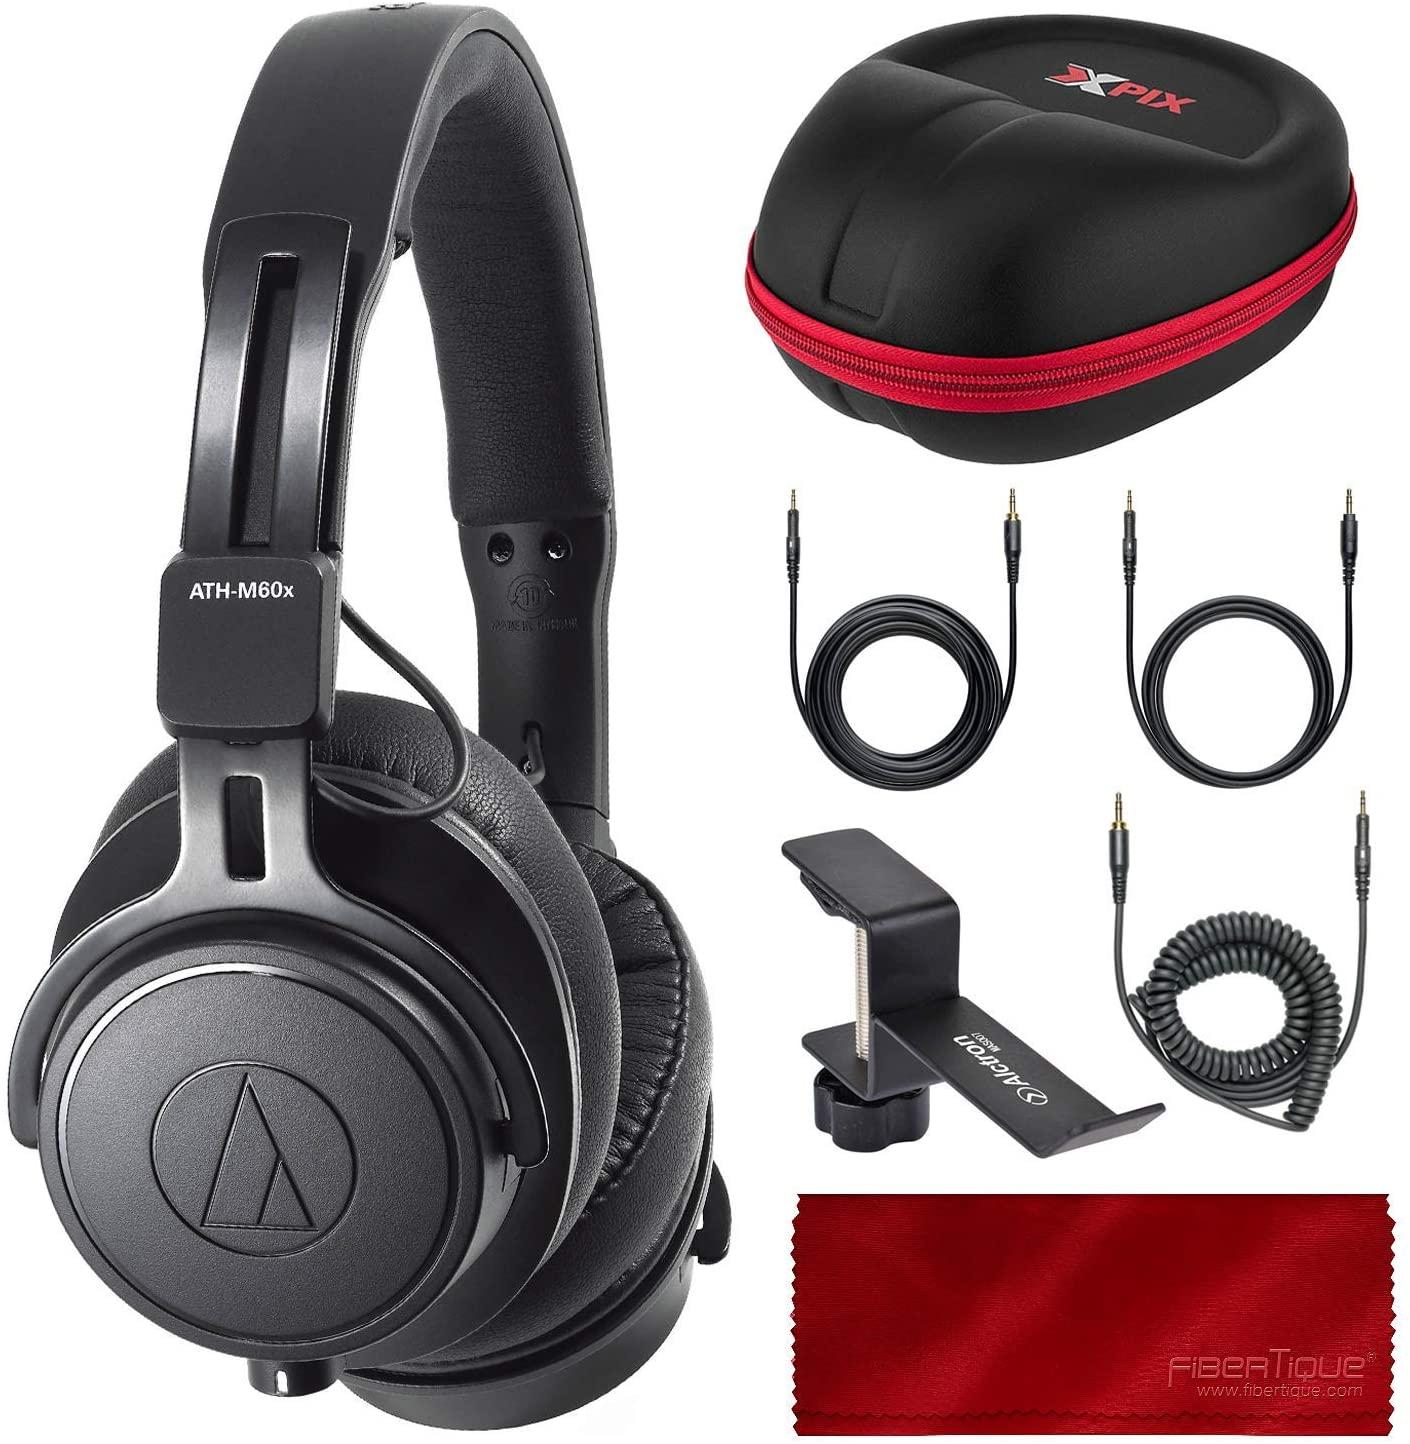 Audio-Technica ATH-M60X On-Ear Closed-Back Dynamic Professional Studio Monitor Headphones, Black with Xpix HardBody Headphone Case and Accessory Bundle